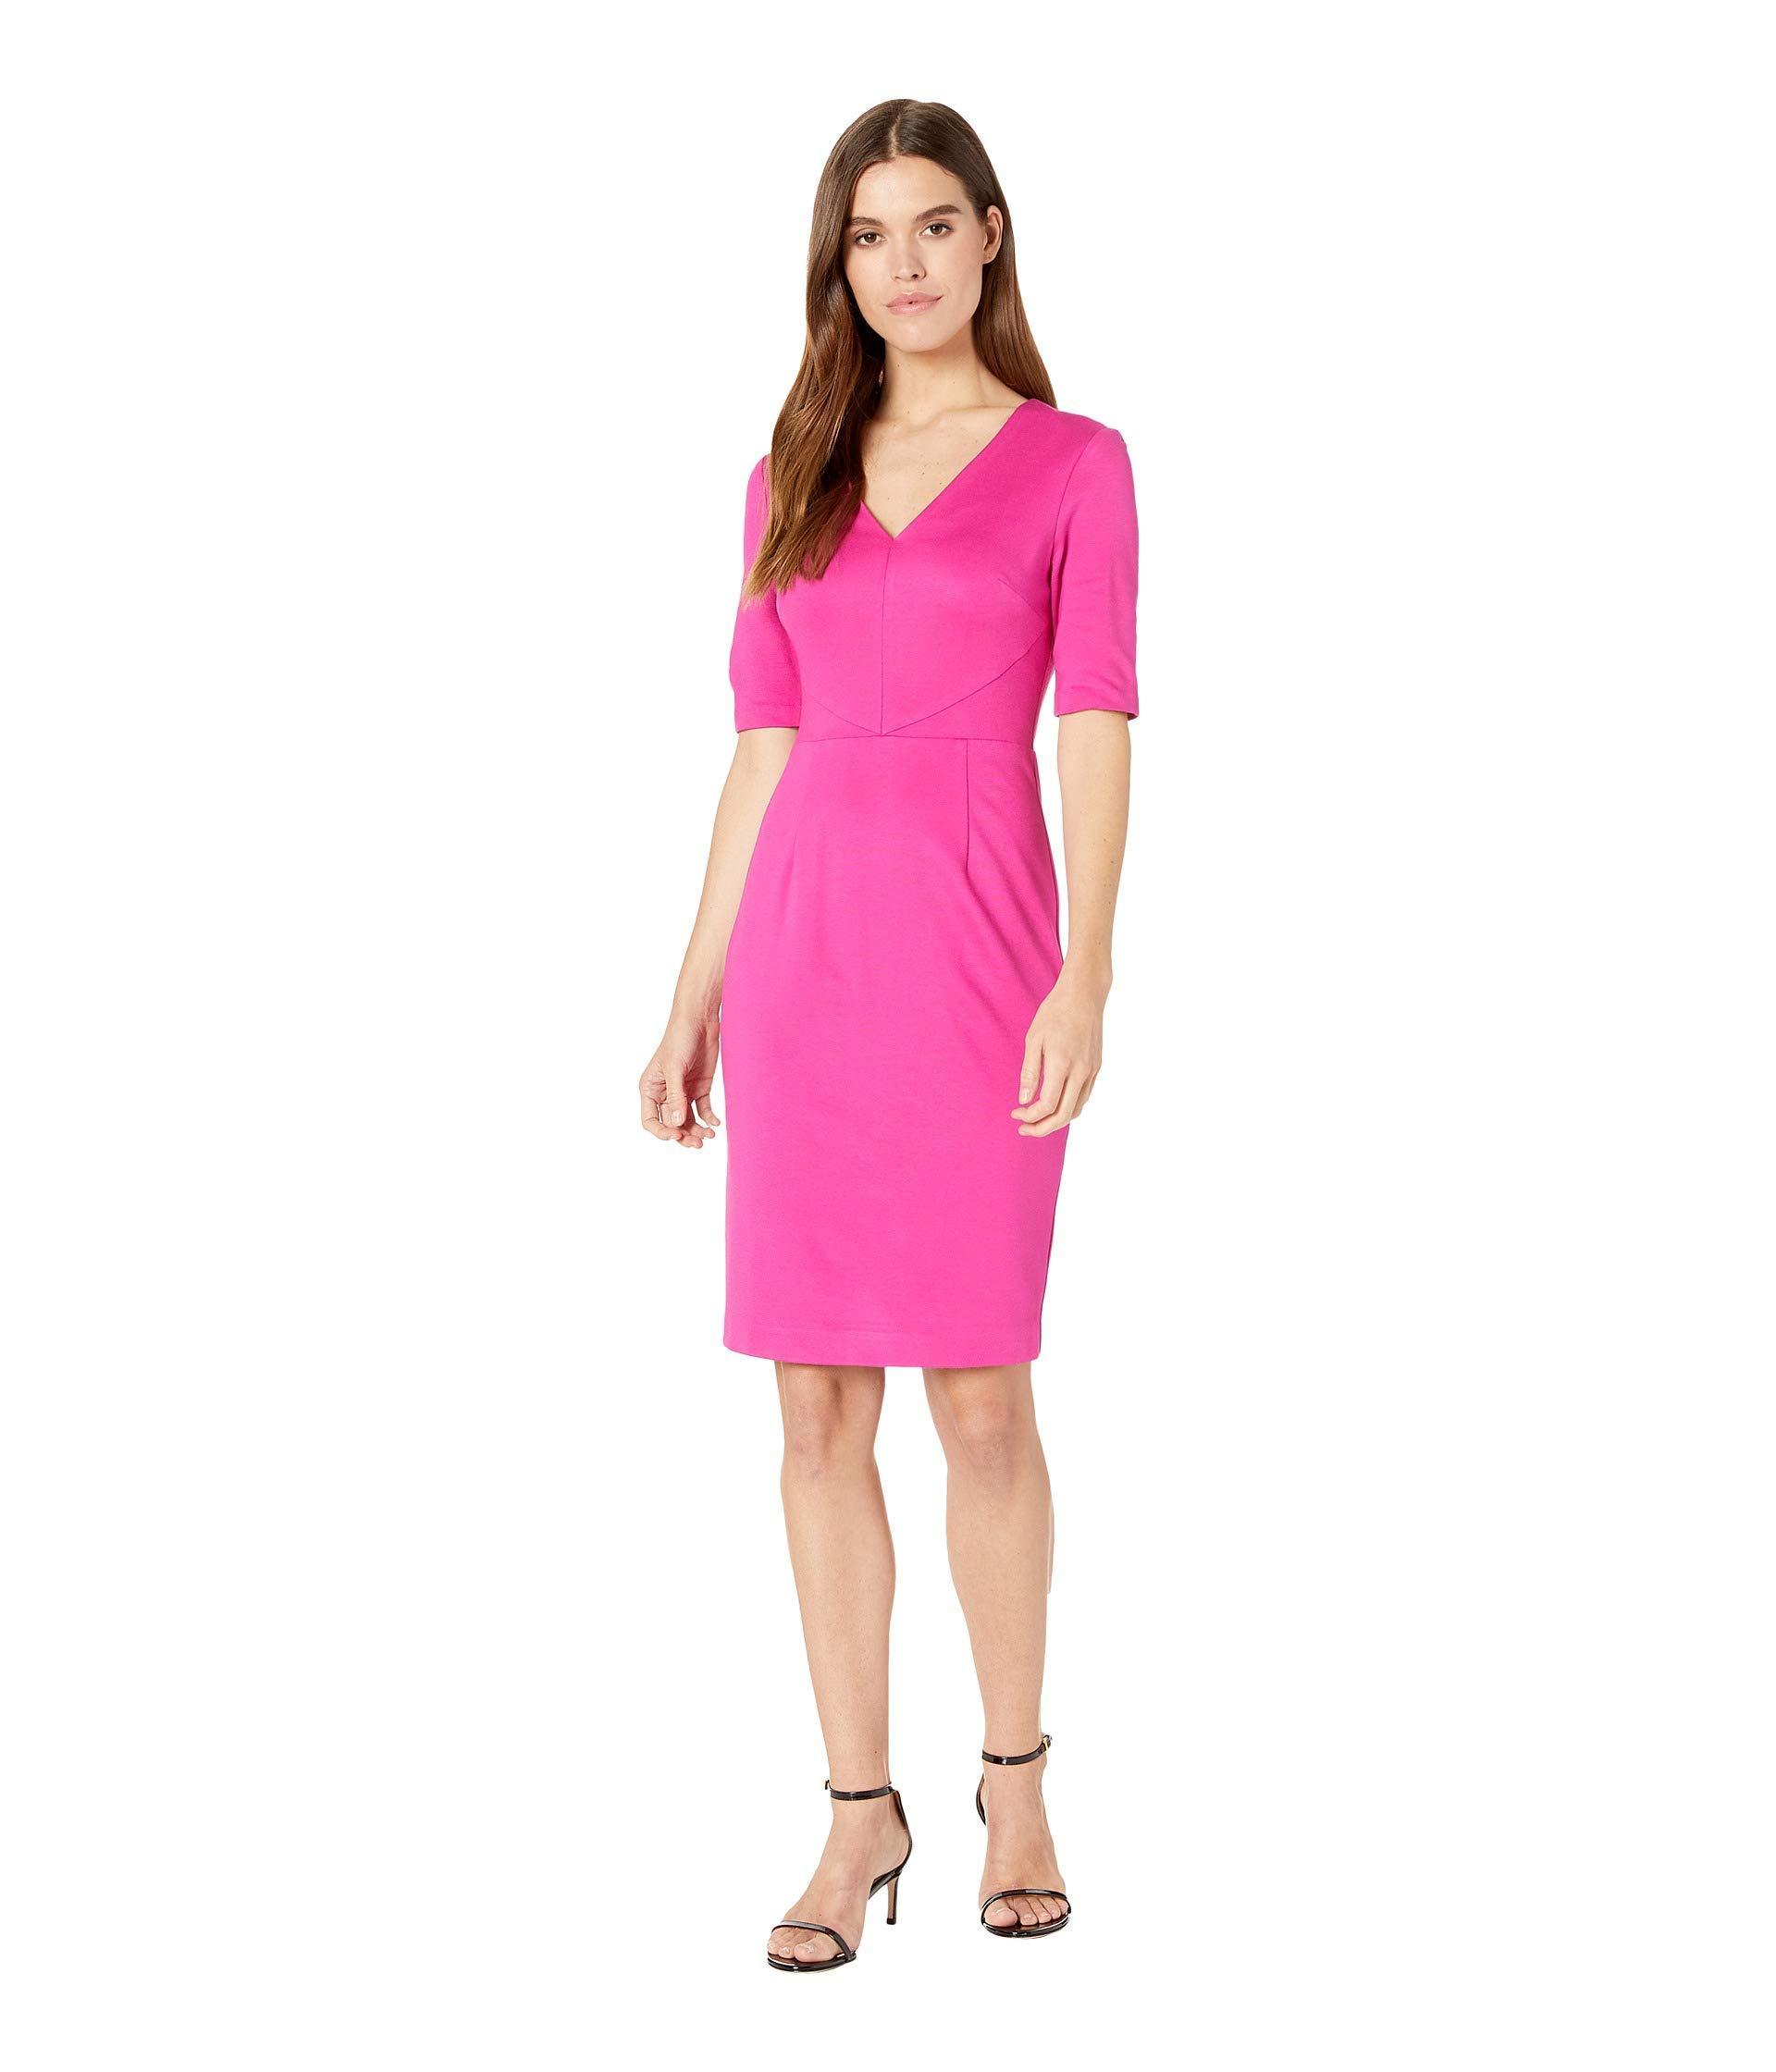 a05c462a36 Trina Turk Locale Dress (vivid Pink) Women s Dress in Pink - Save 10 ...